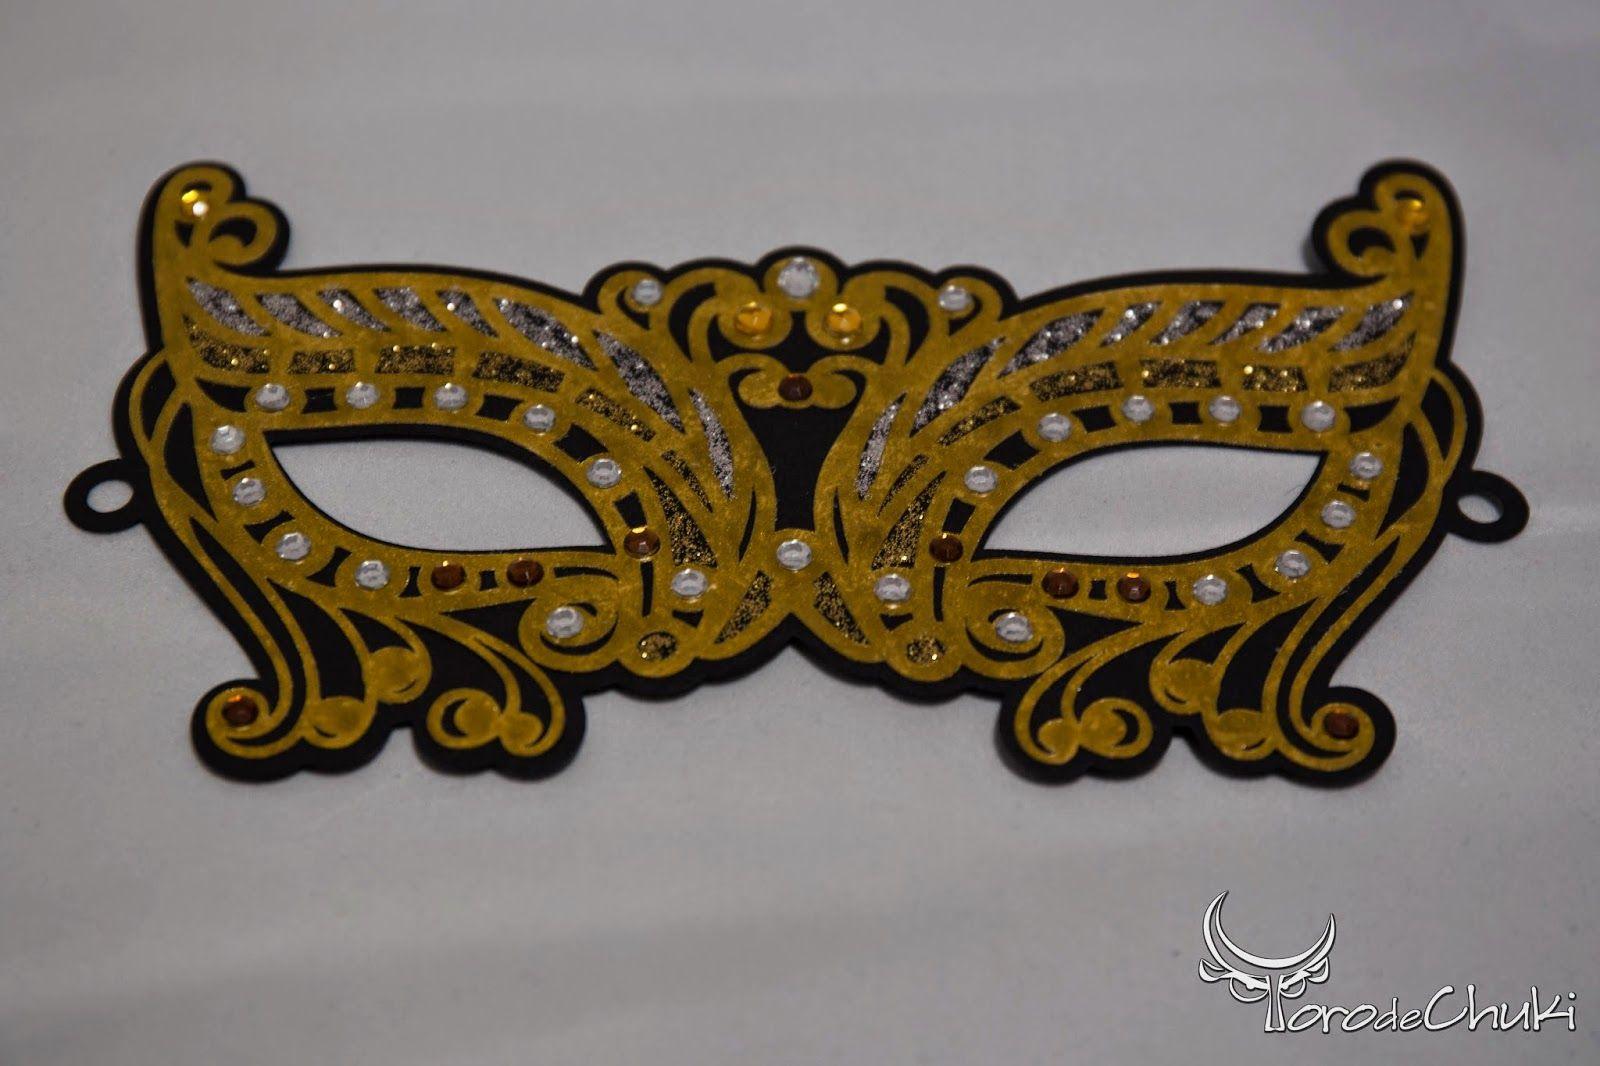 Awesome SVGs Blinged Up Masquerade Mask. Masquerade